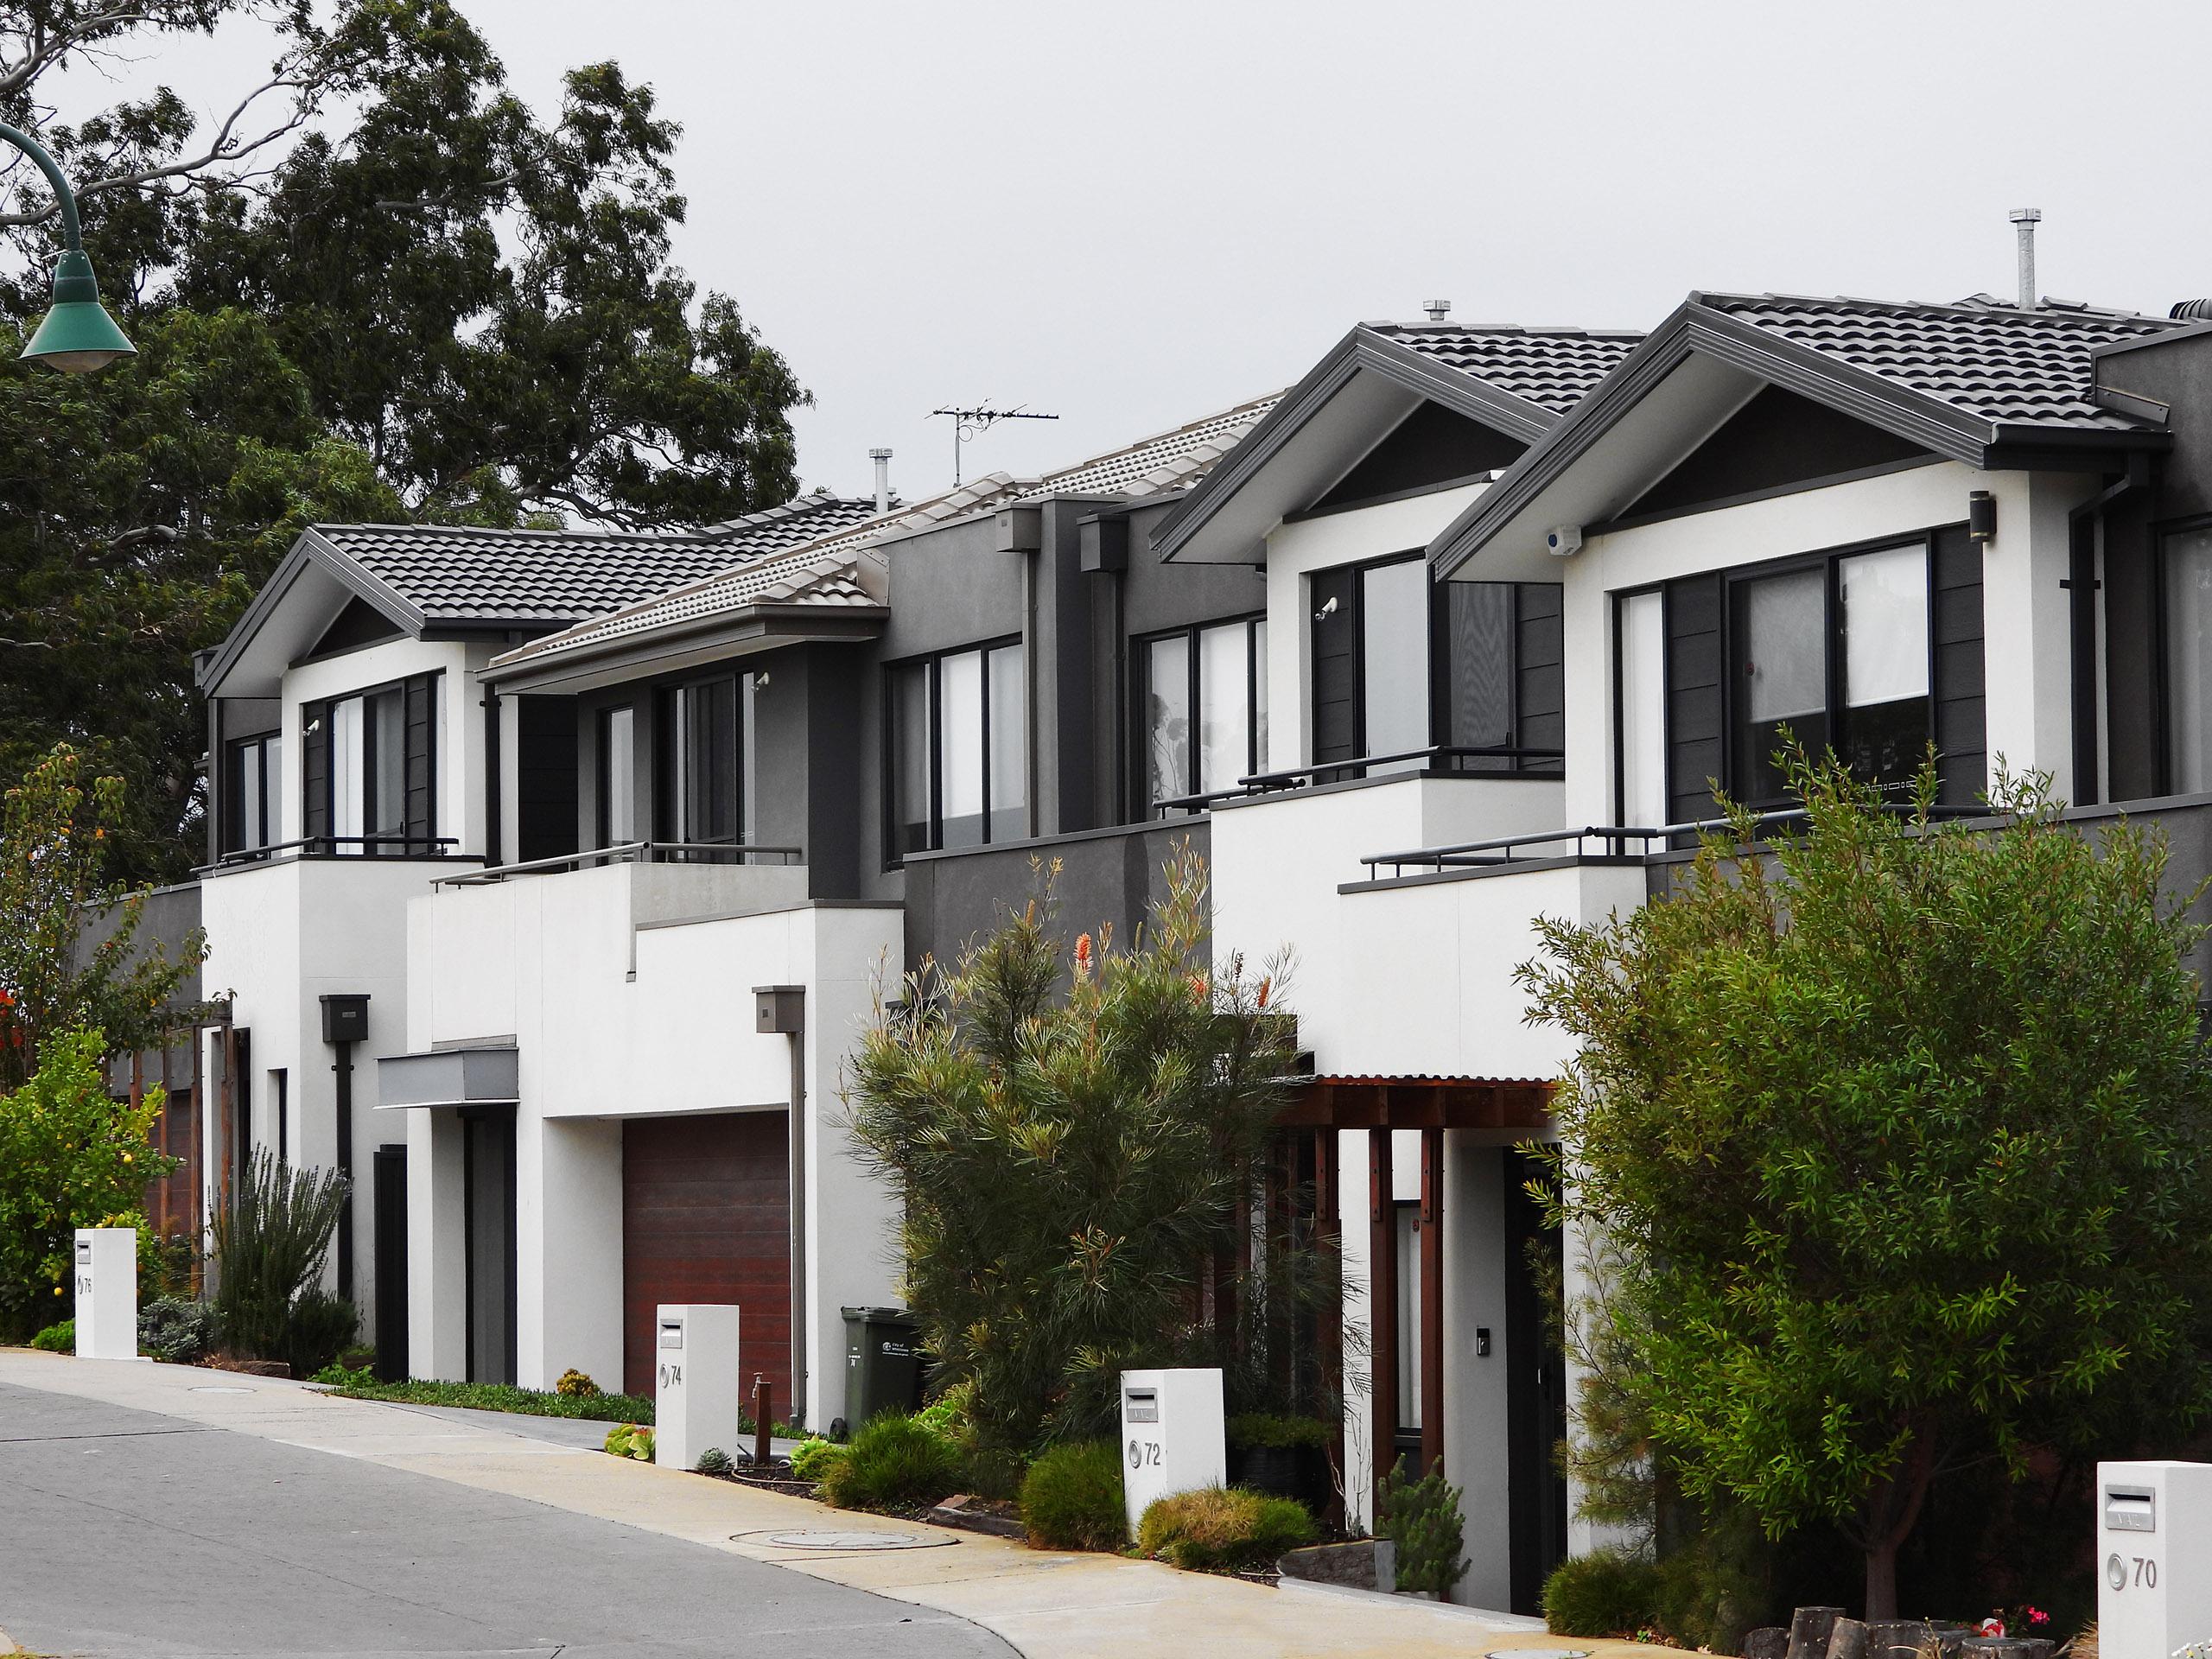 Bundoora Townhouse Development